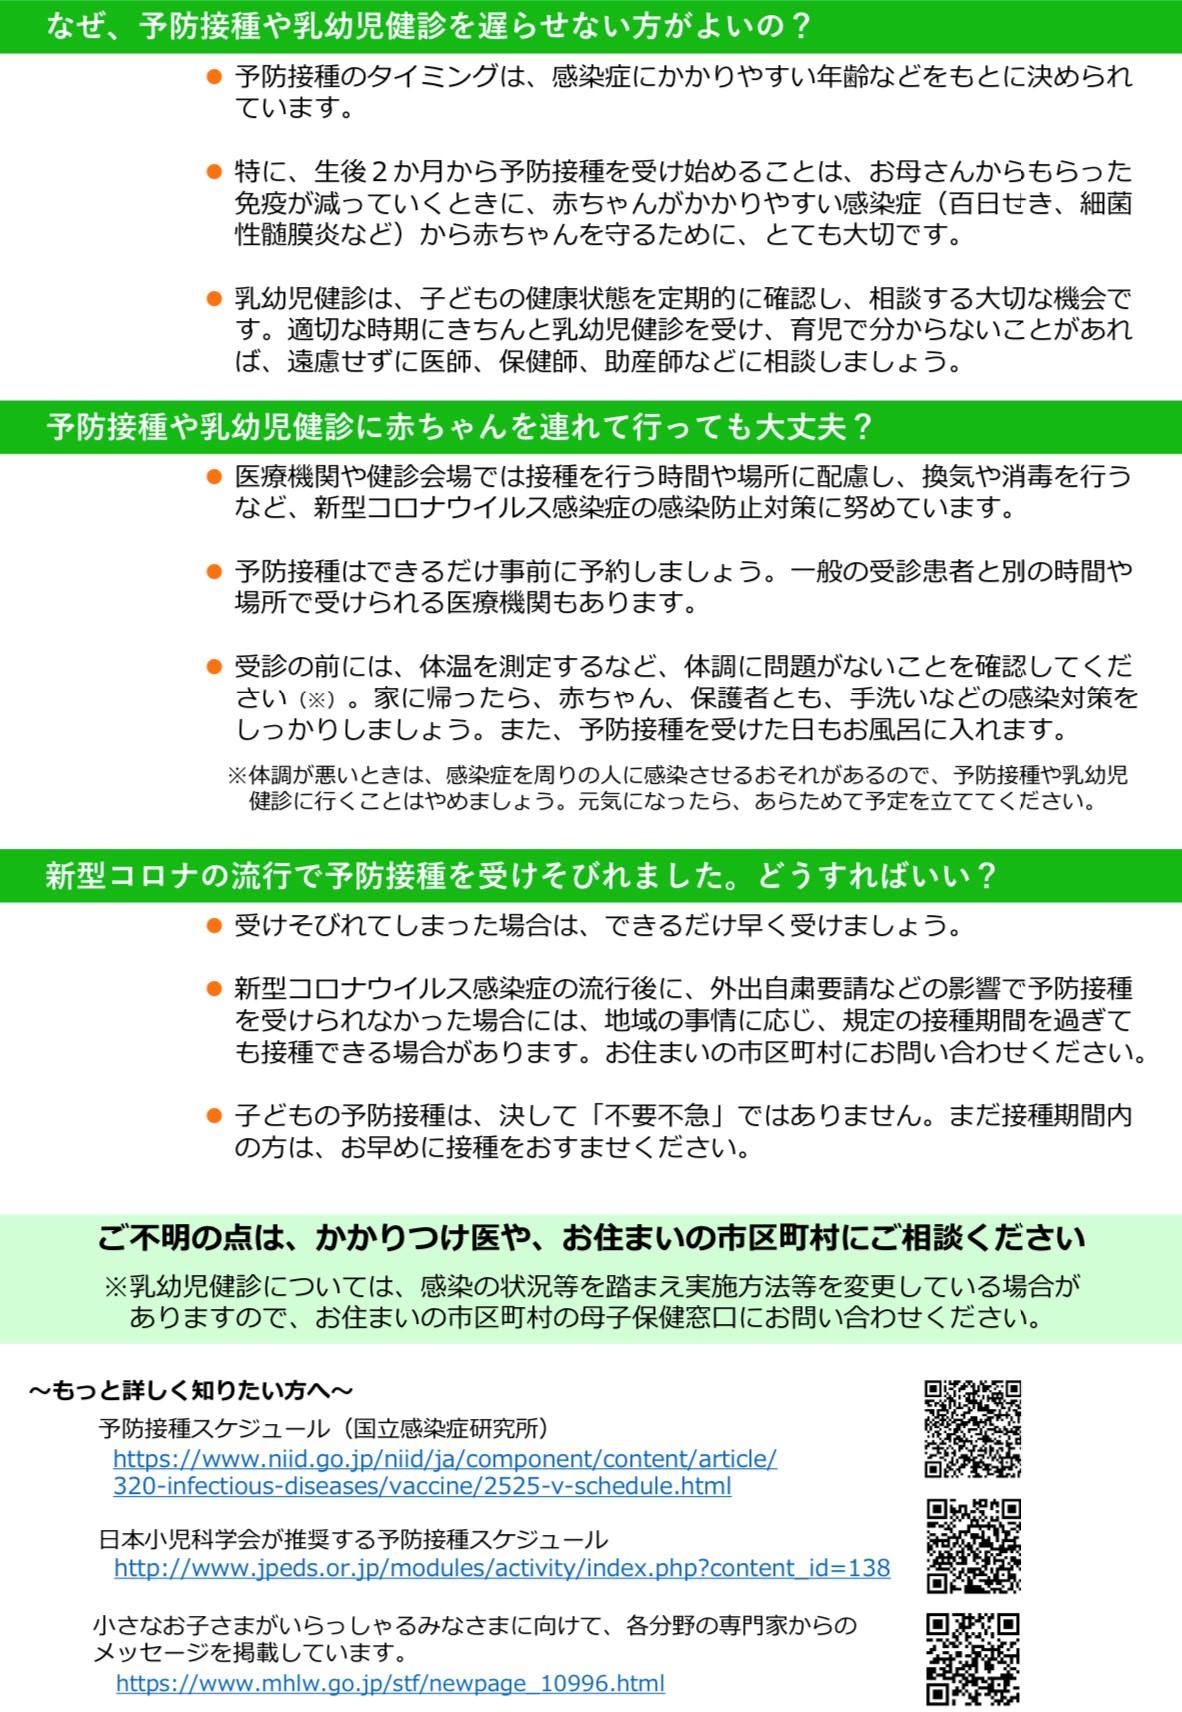 予防接種 厚生労働省ポスター2